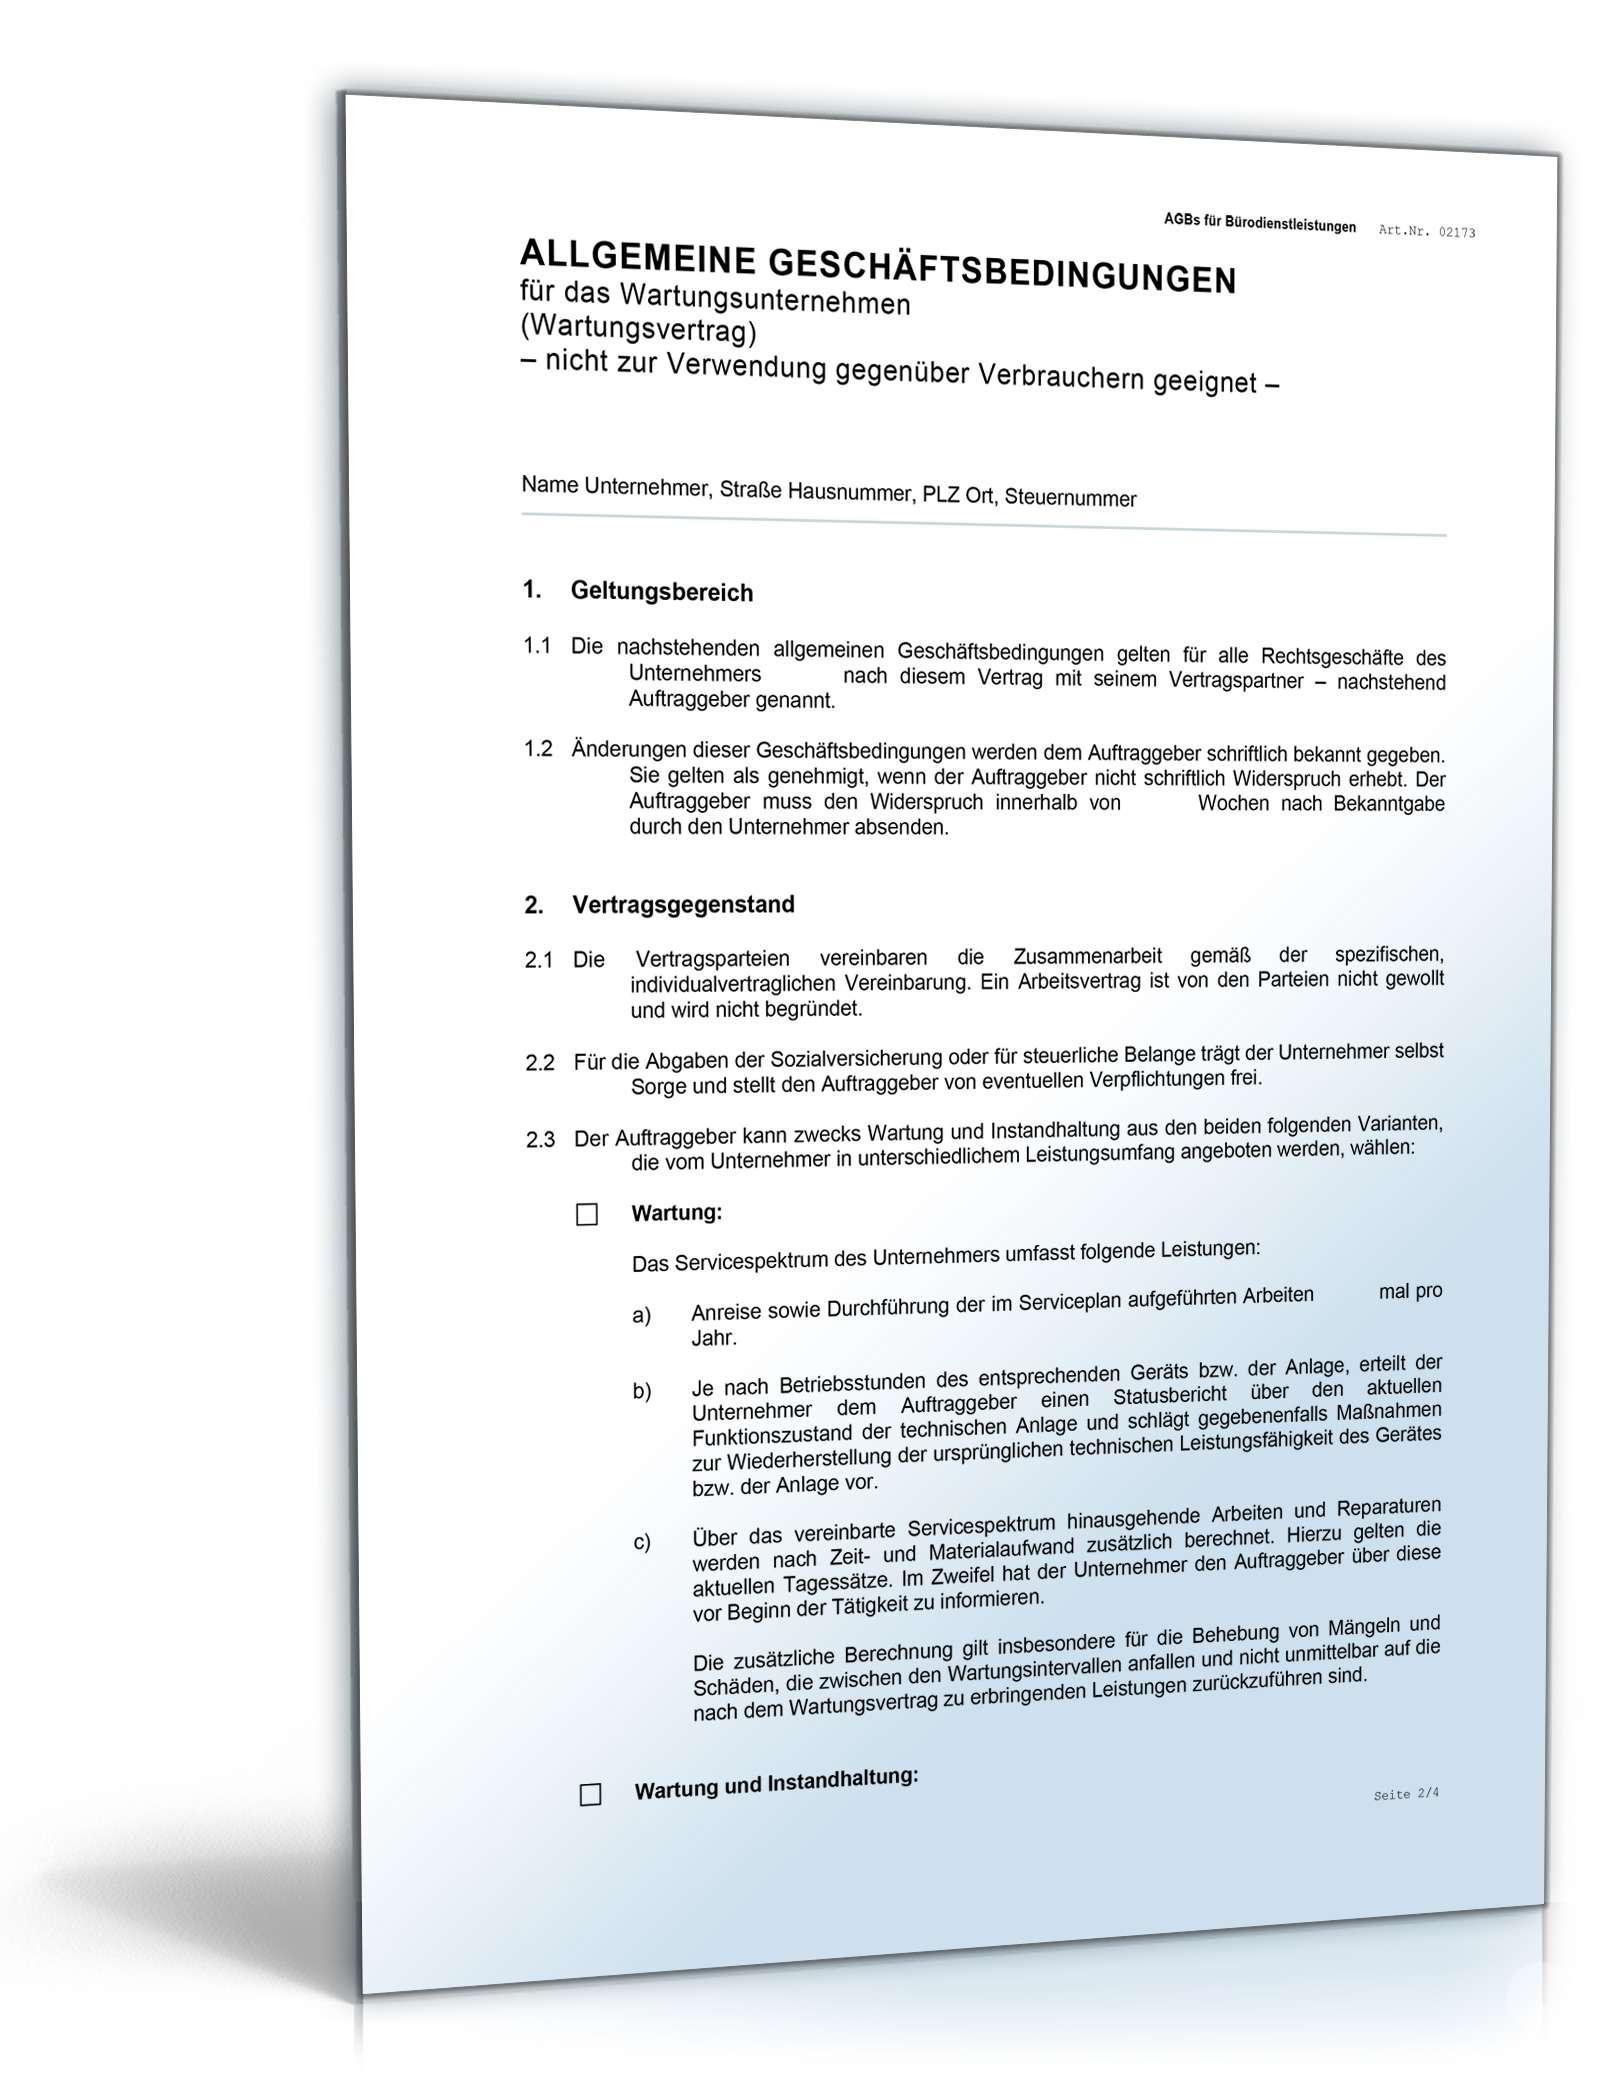 Agb Wartungsunternehmen Rechtssicheres Muster Zum Download